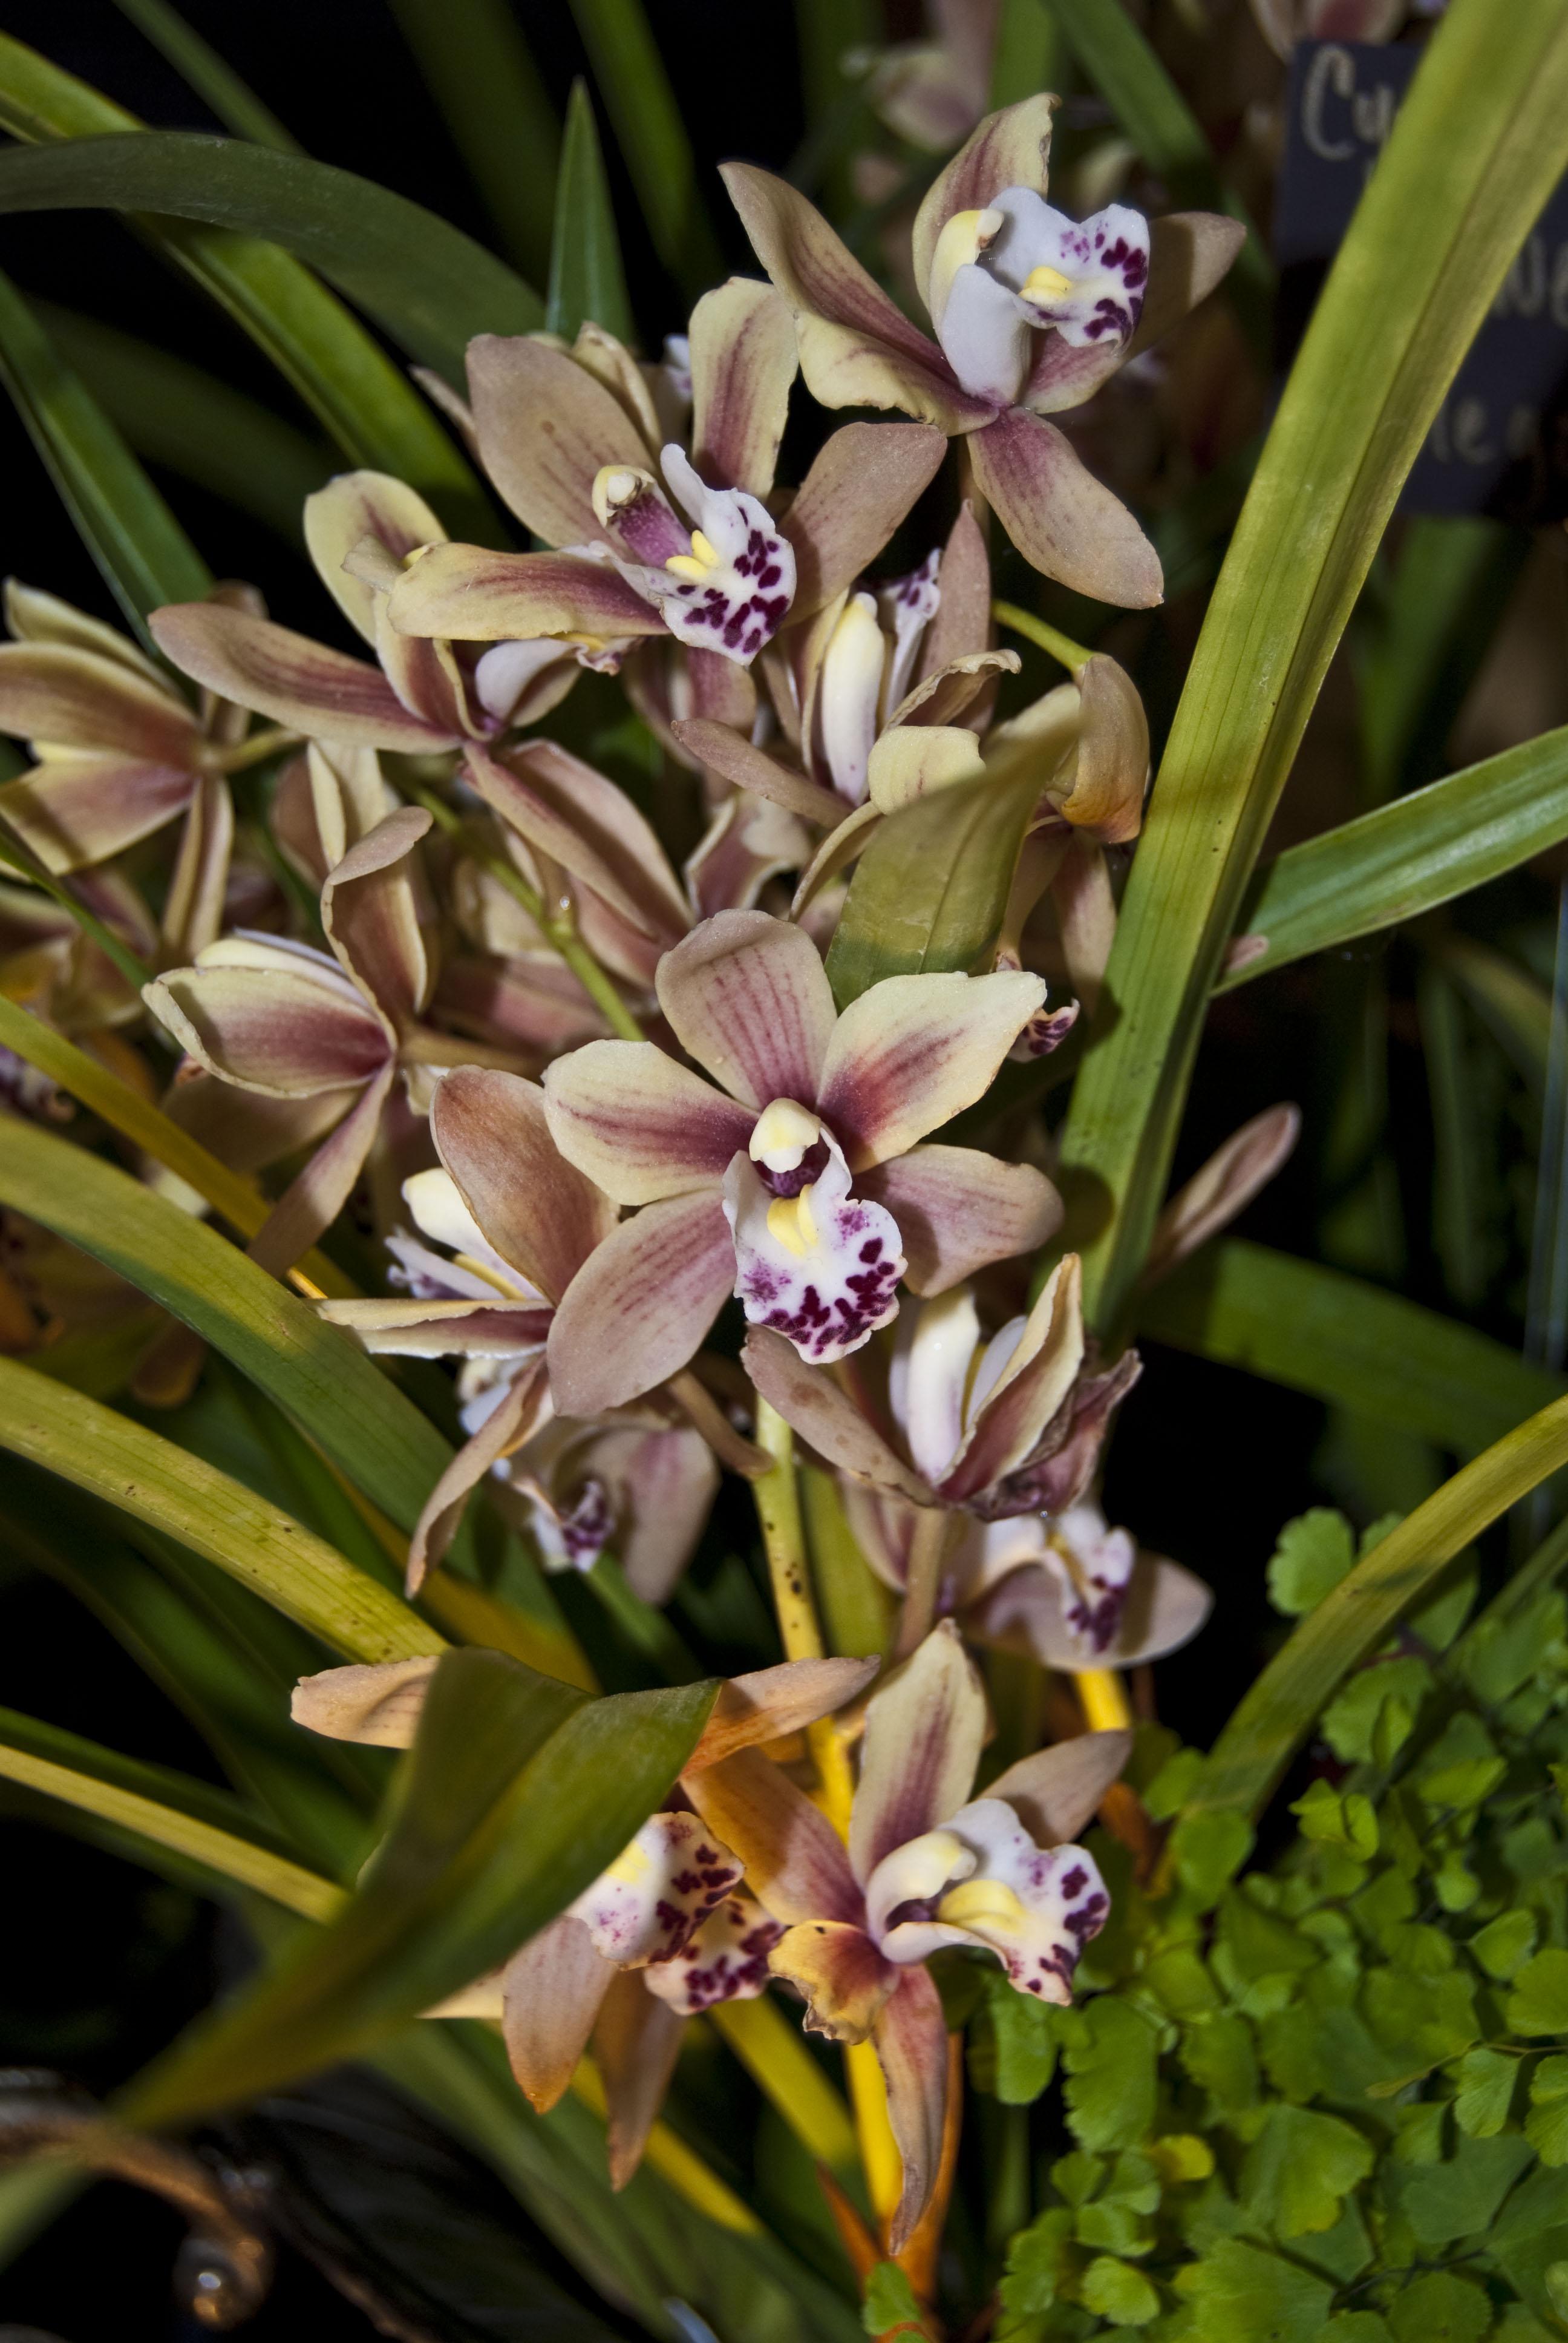 http://images4.wikia.nocookie.net/__cb20100307003707/orchids/en/images/5/53/Cymbidium_Sweetheart_%27Elegance%27_.jpg